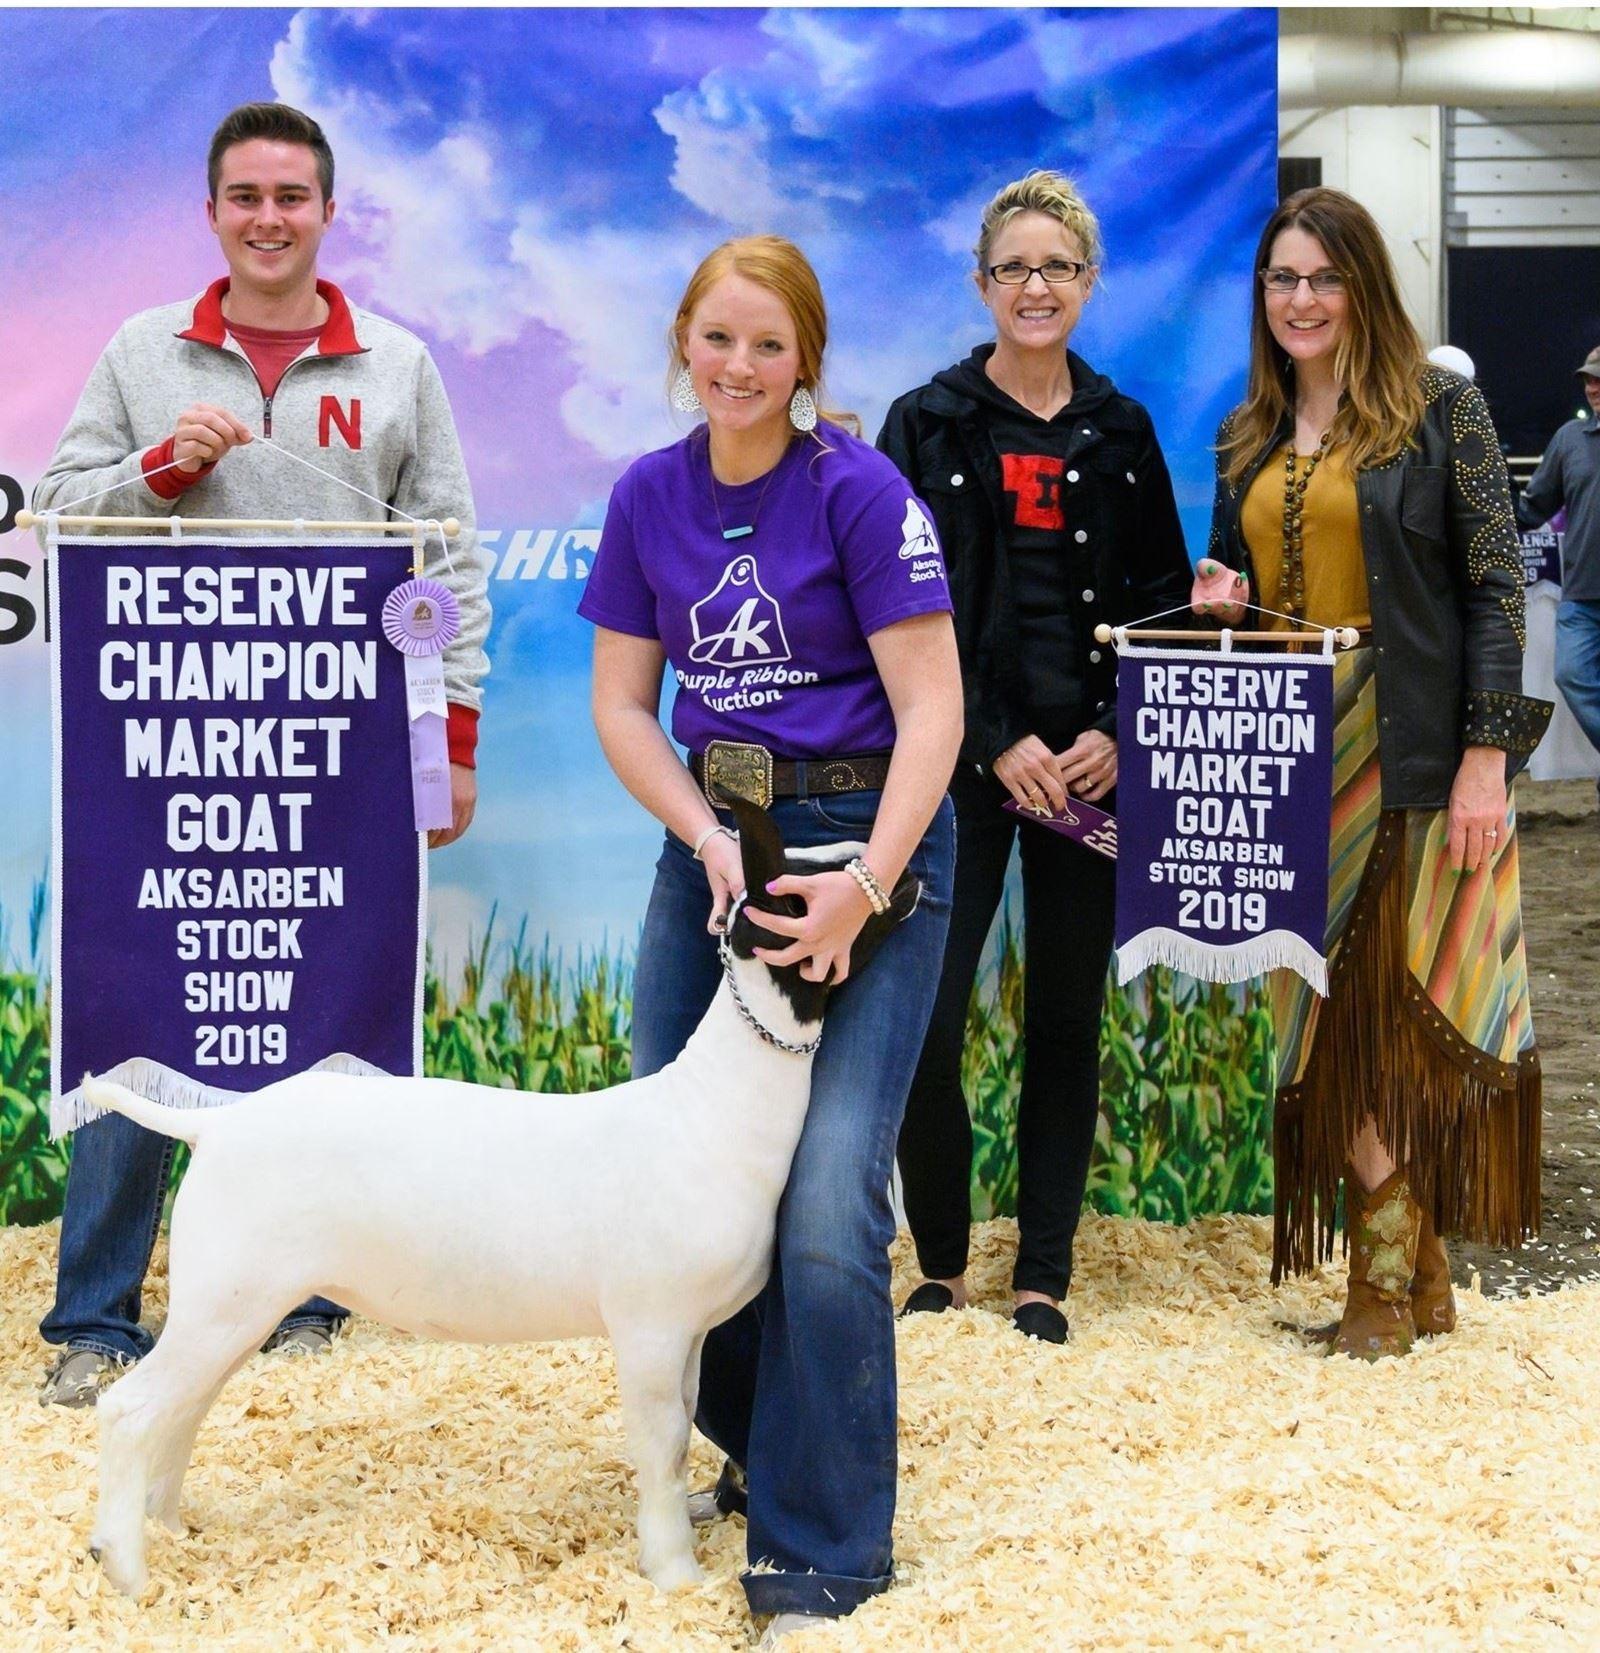 Reserve Champion Market Goat